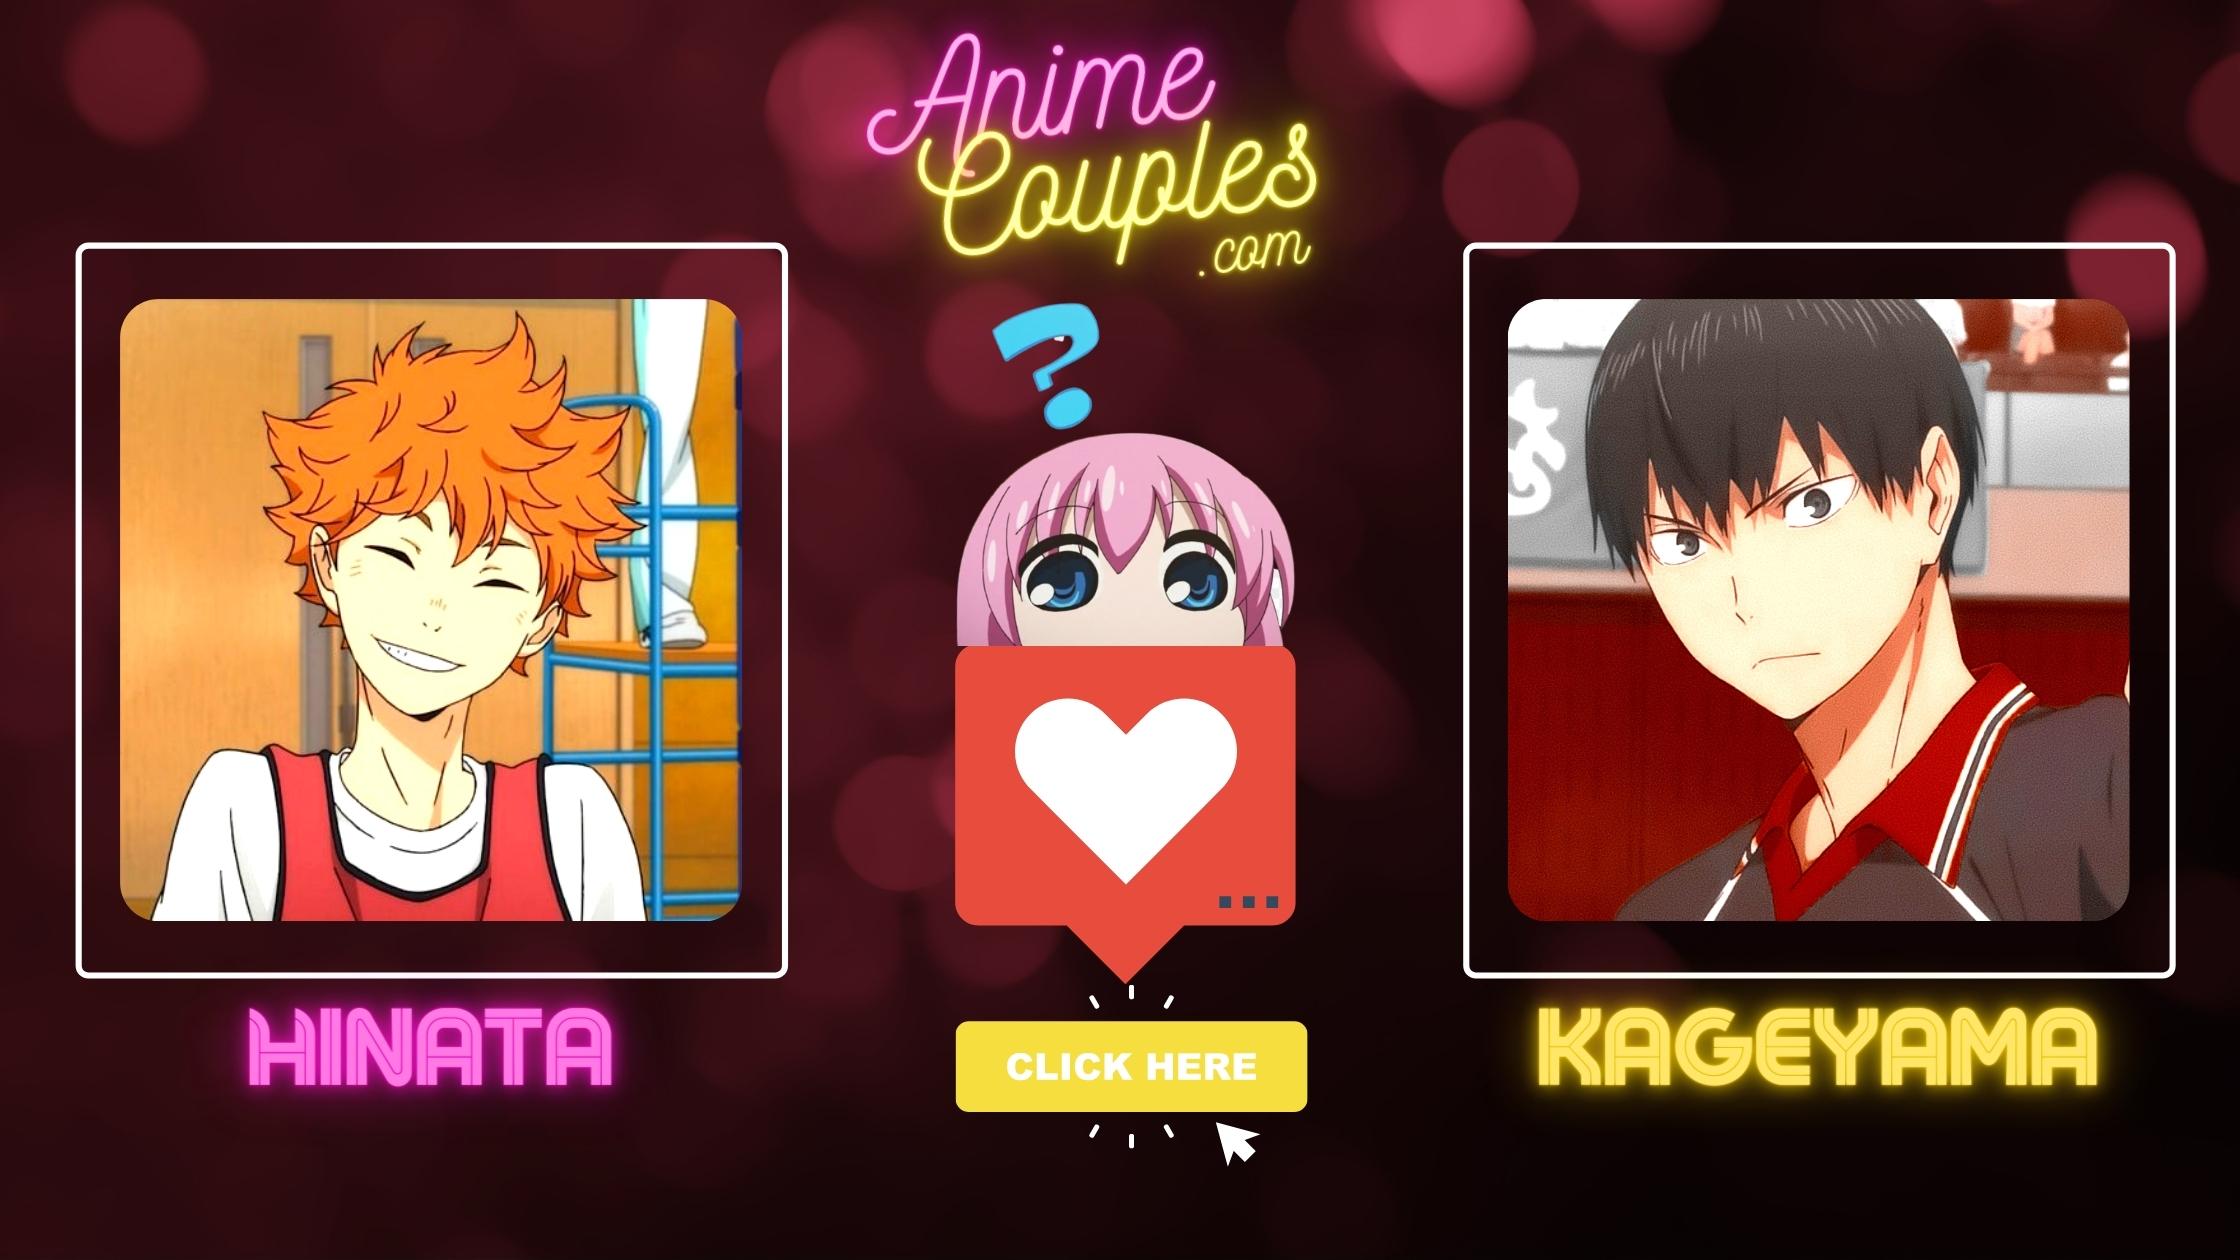 Hinata and Kageyama - Haikyuu Couple